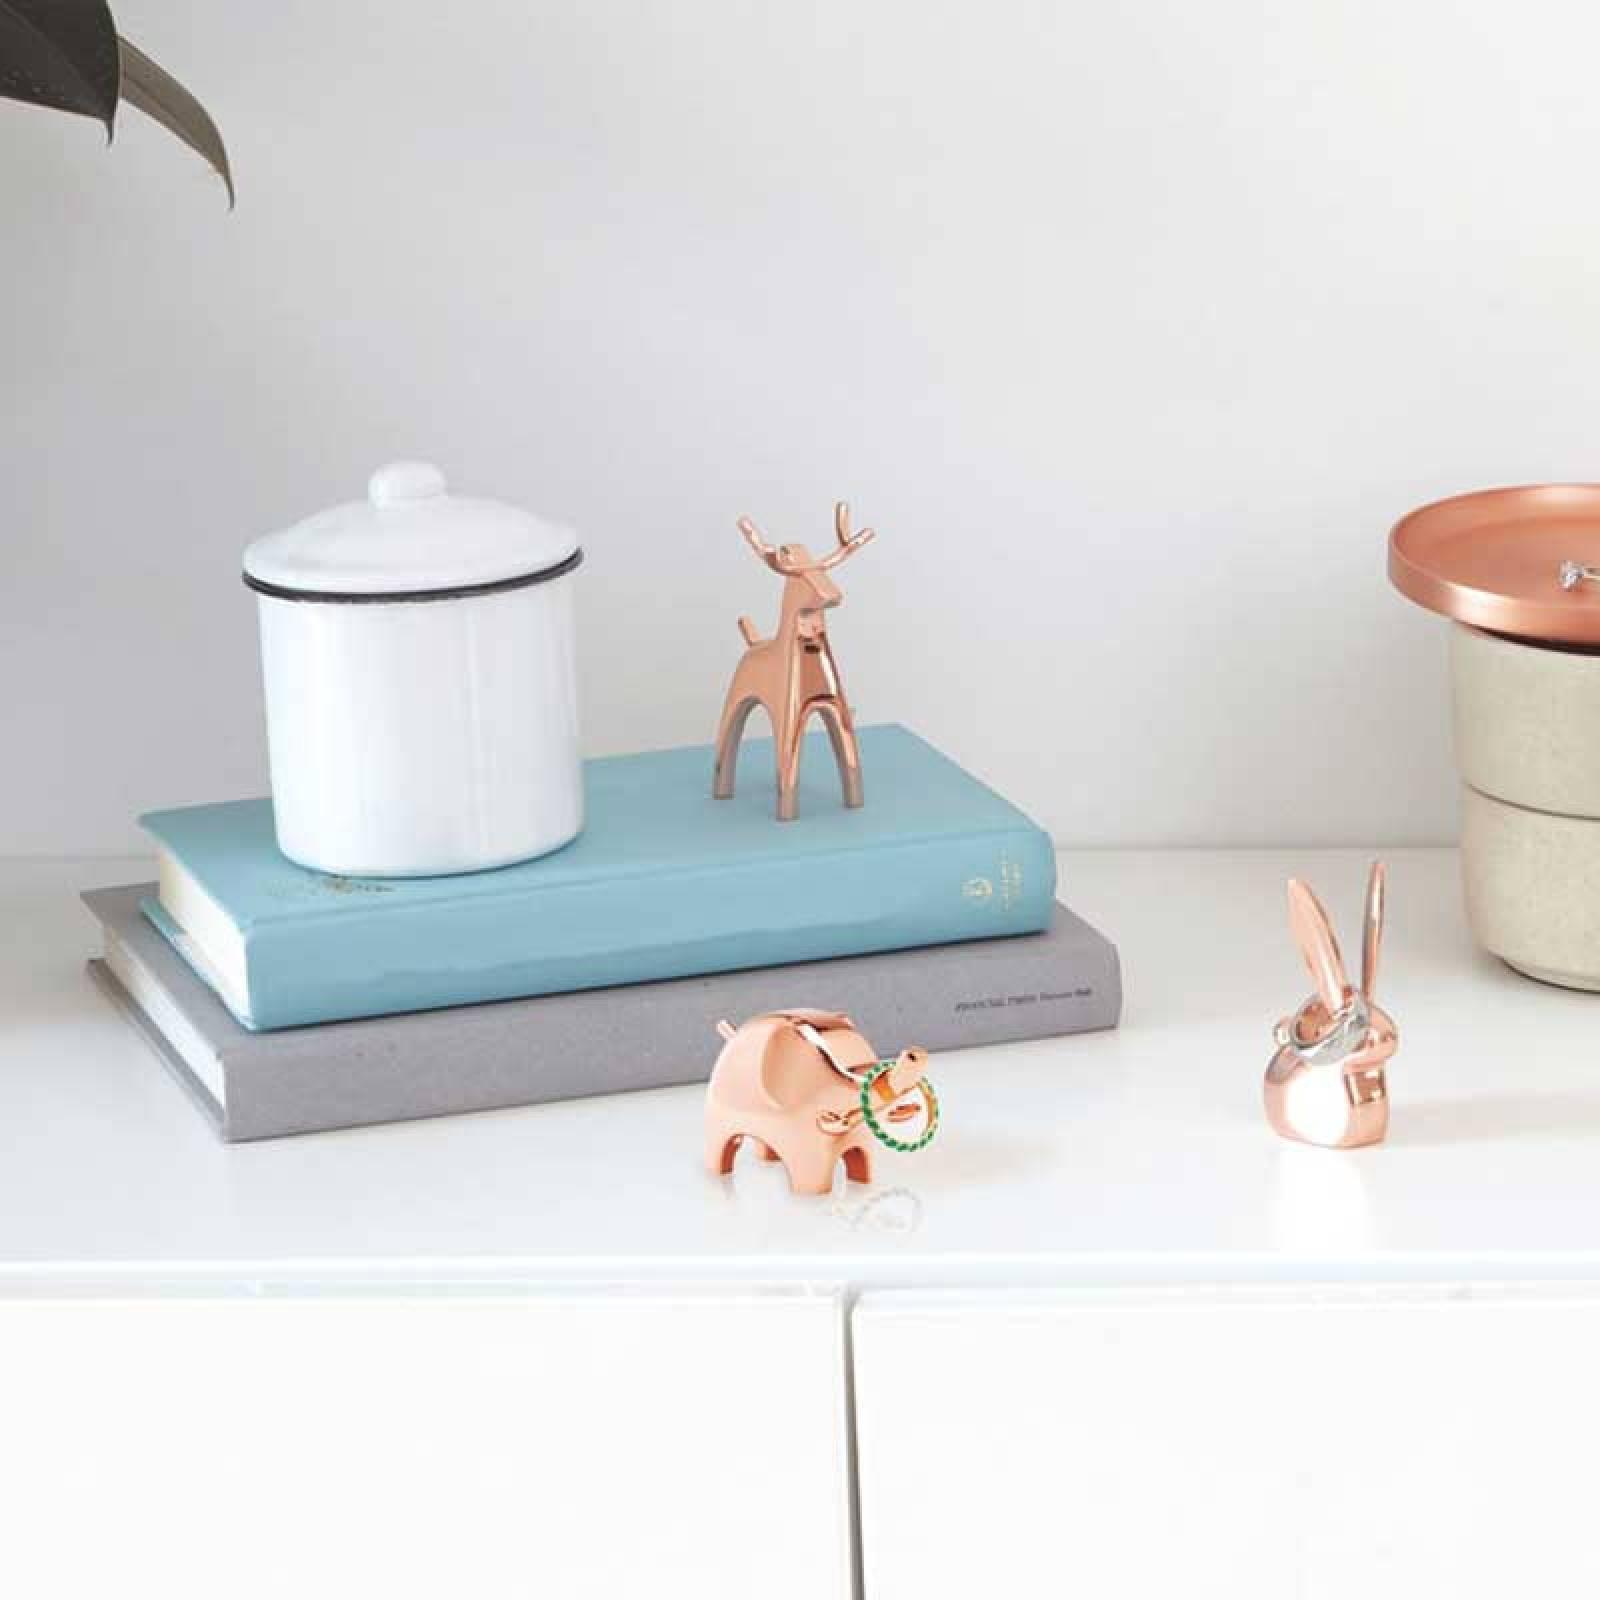 Anigram Reindeer Copper Ring Holder/ Decoration thumbnails